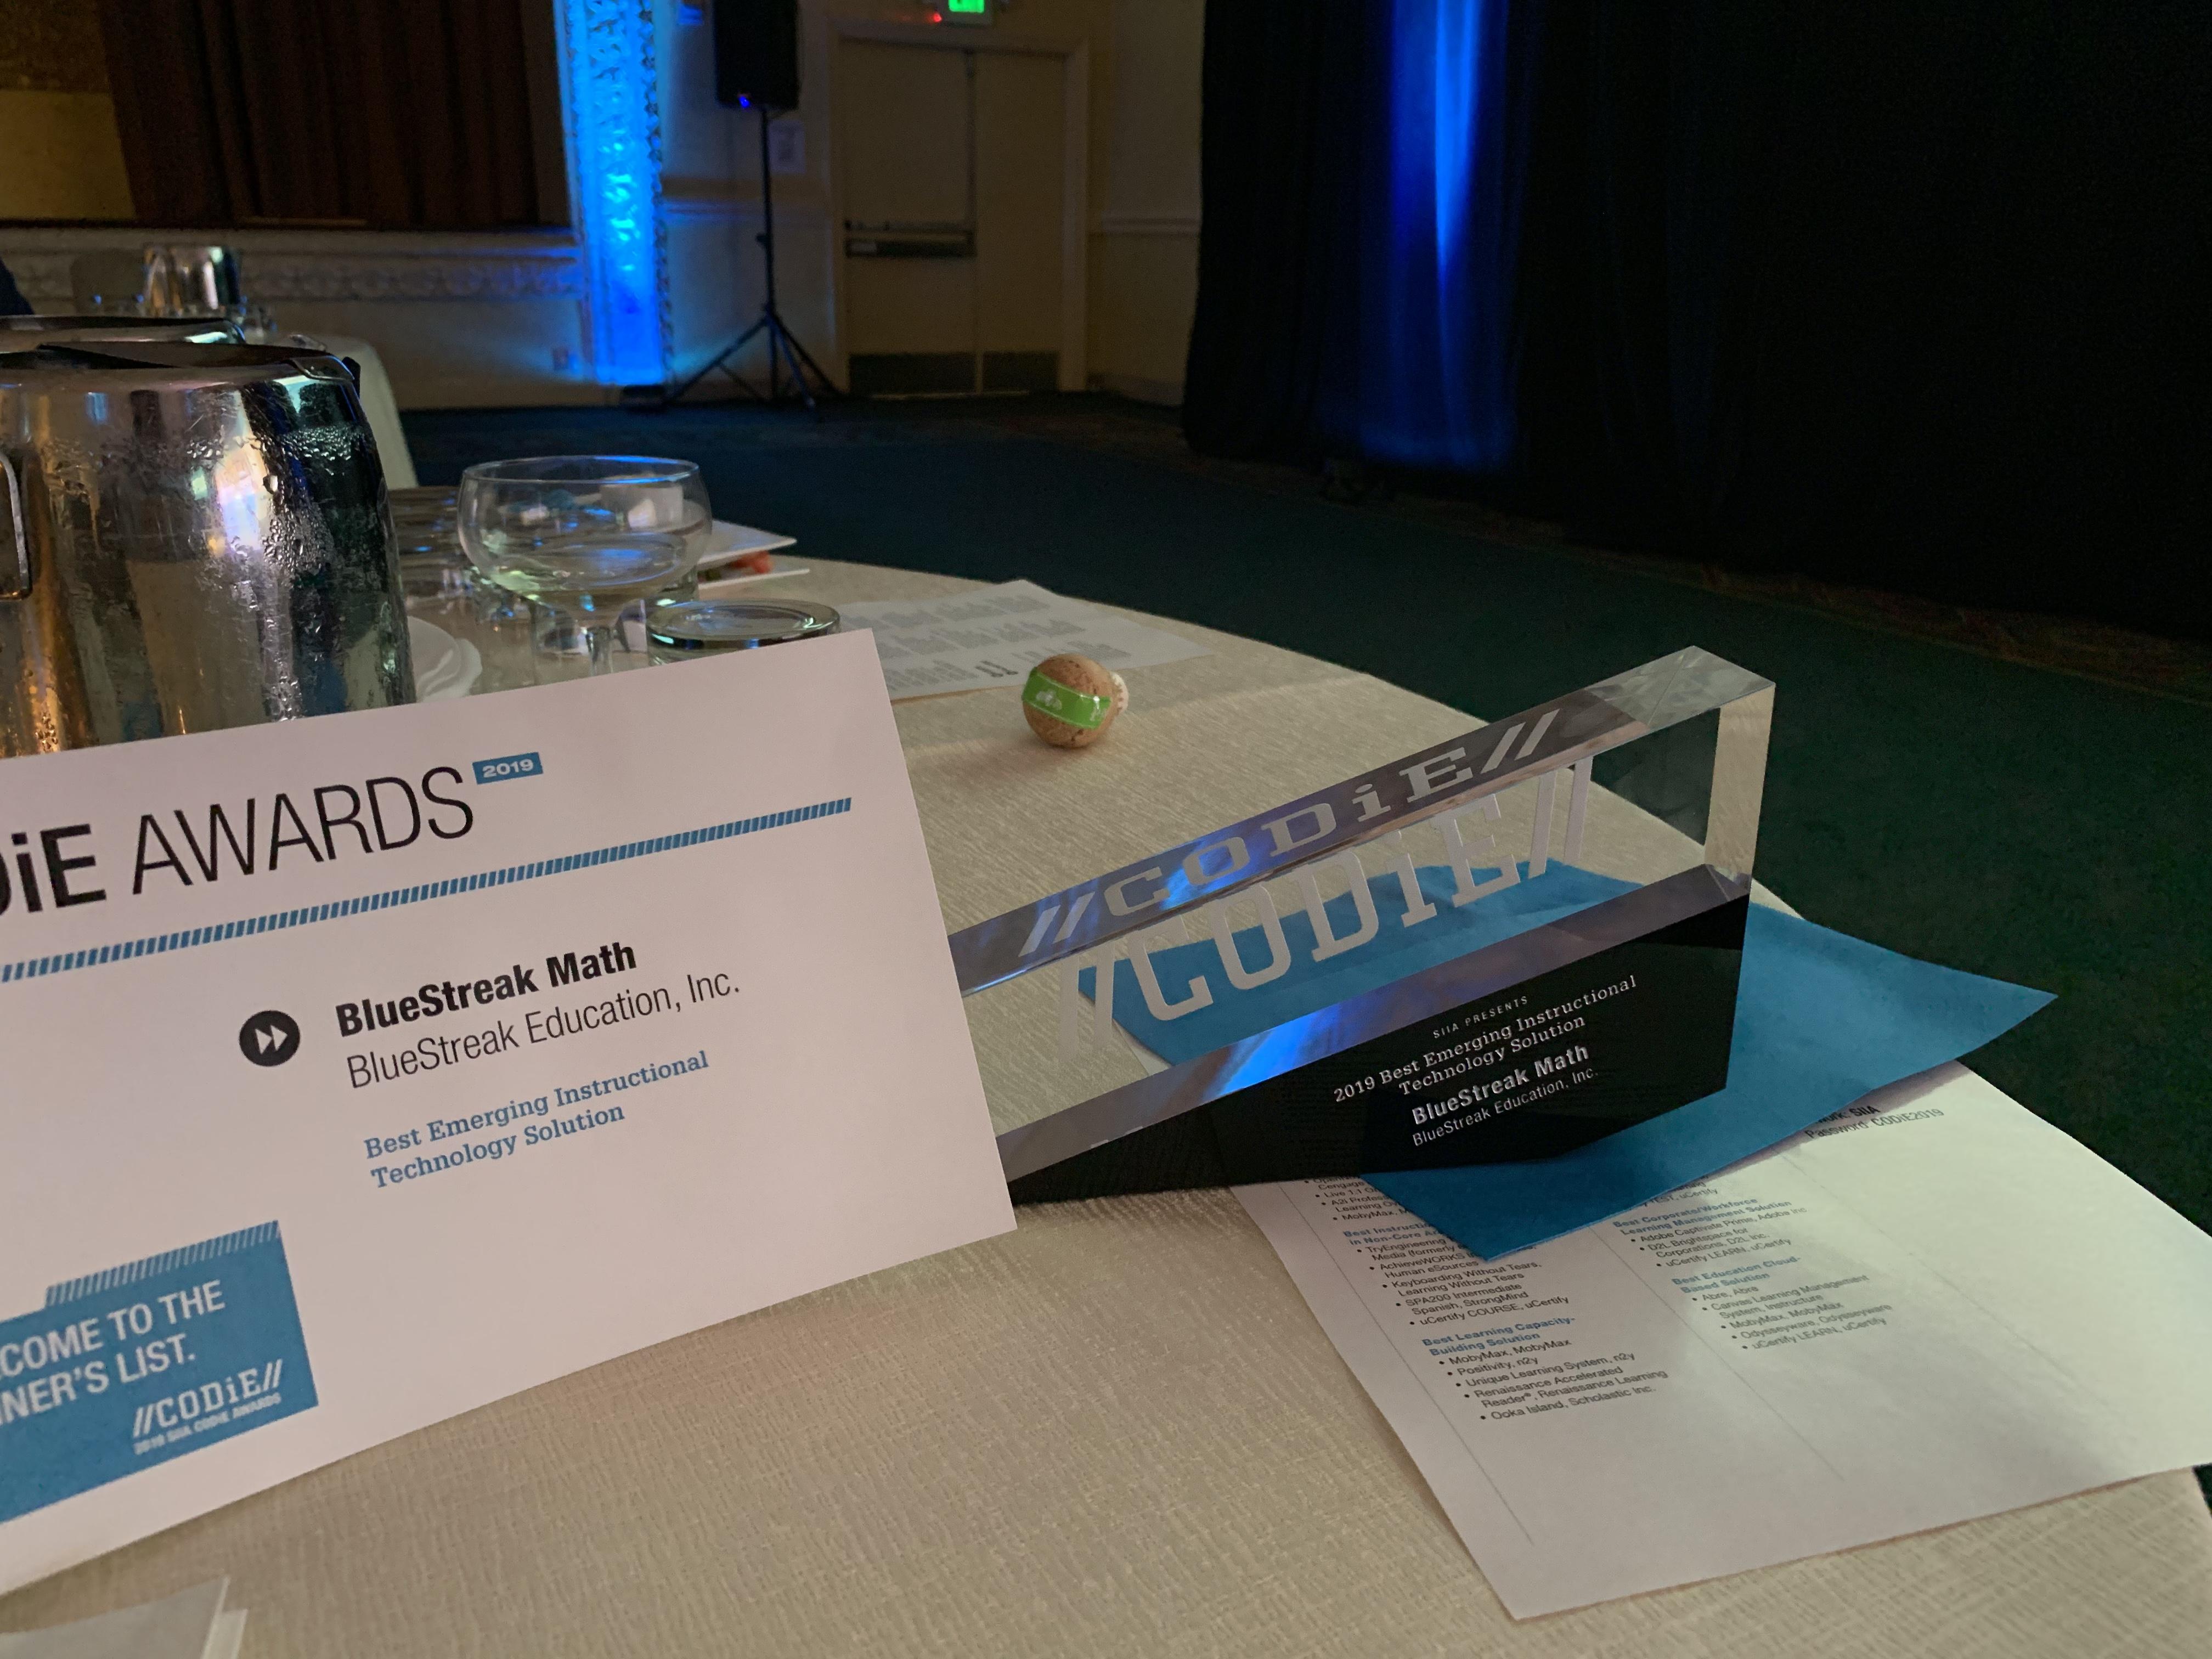 BlueStreak CODiE Award 2019 – Thanks Catherine, Mitch + team!